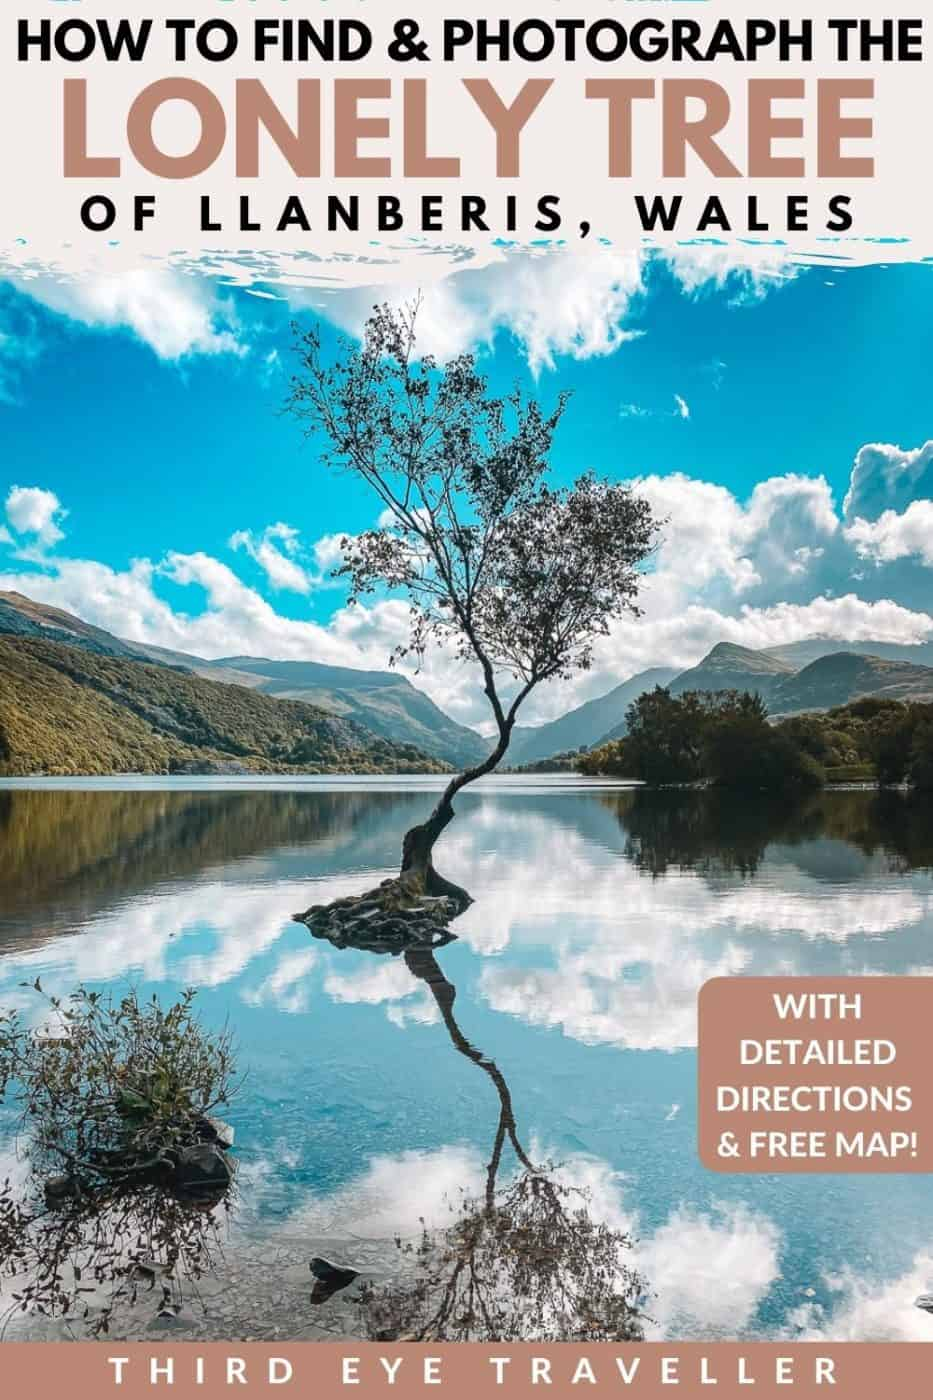 Lonely Tree Llanberis Location Snowdonia